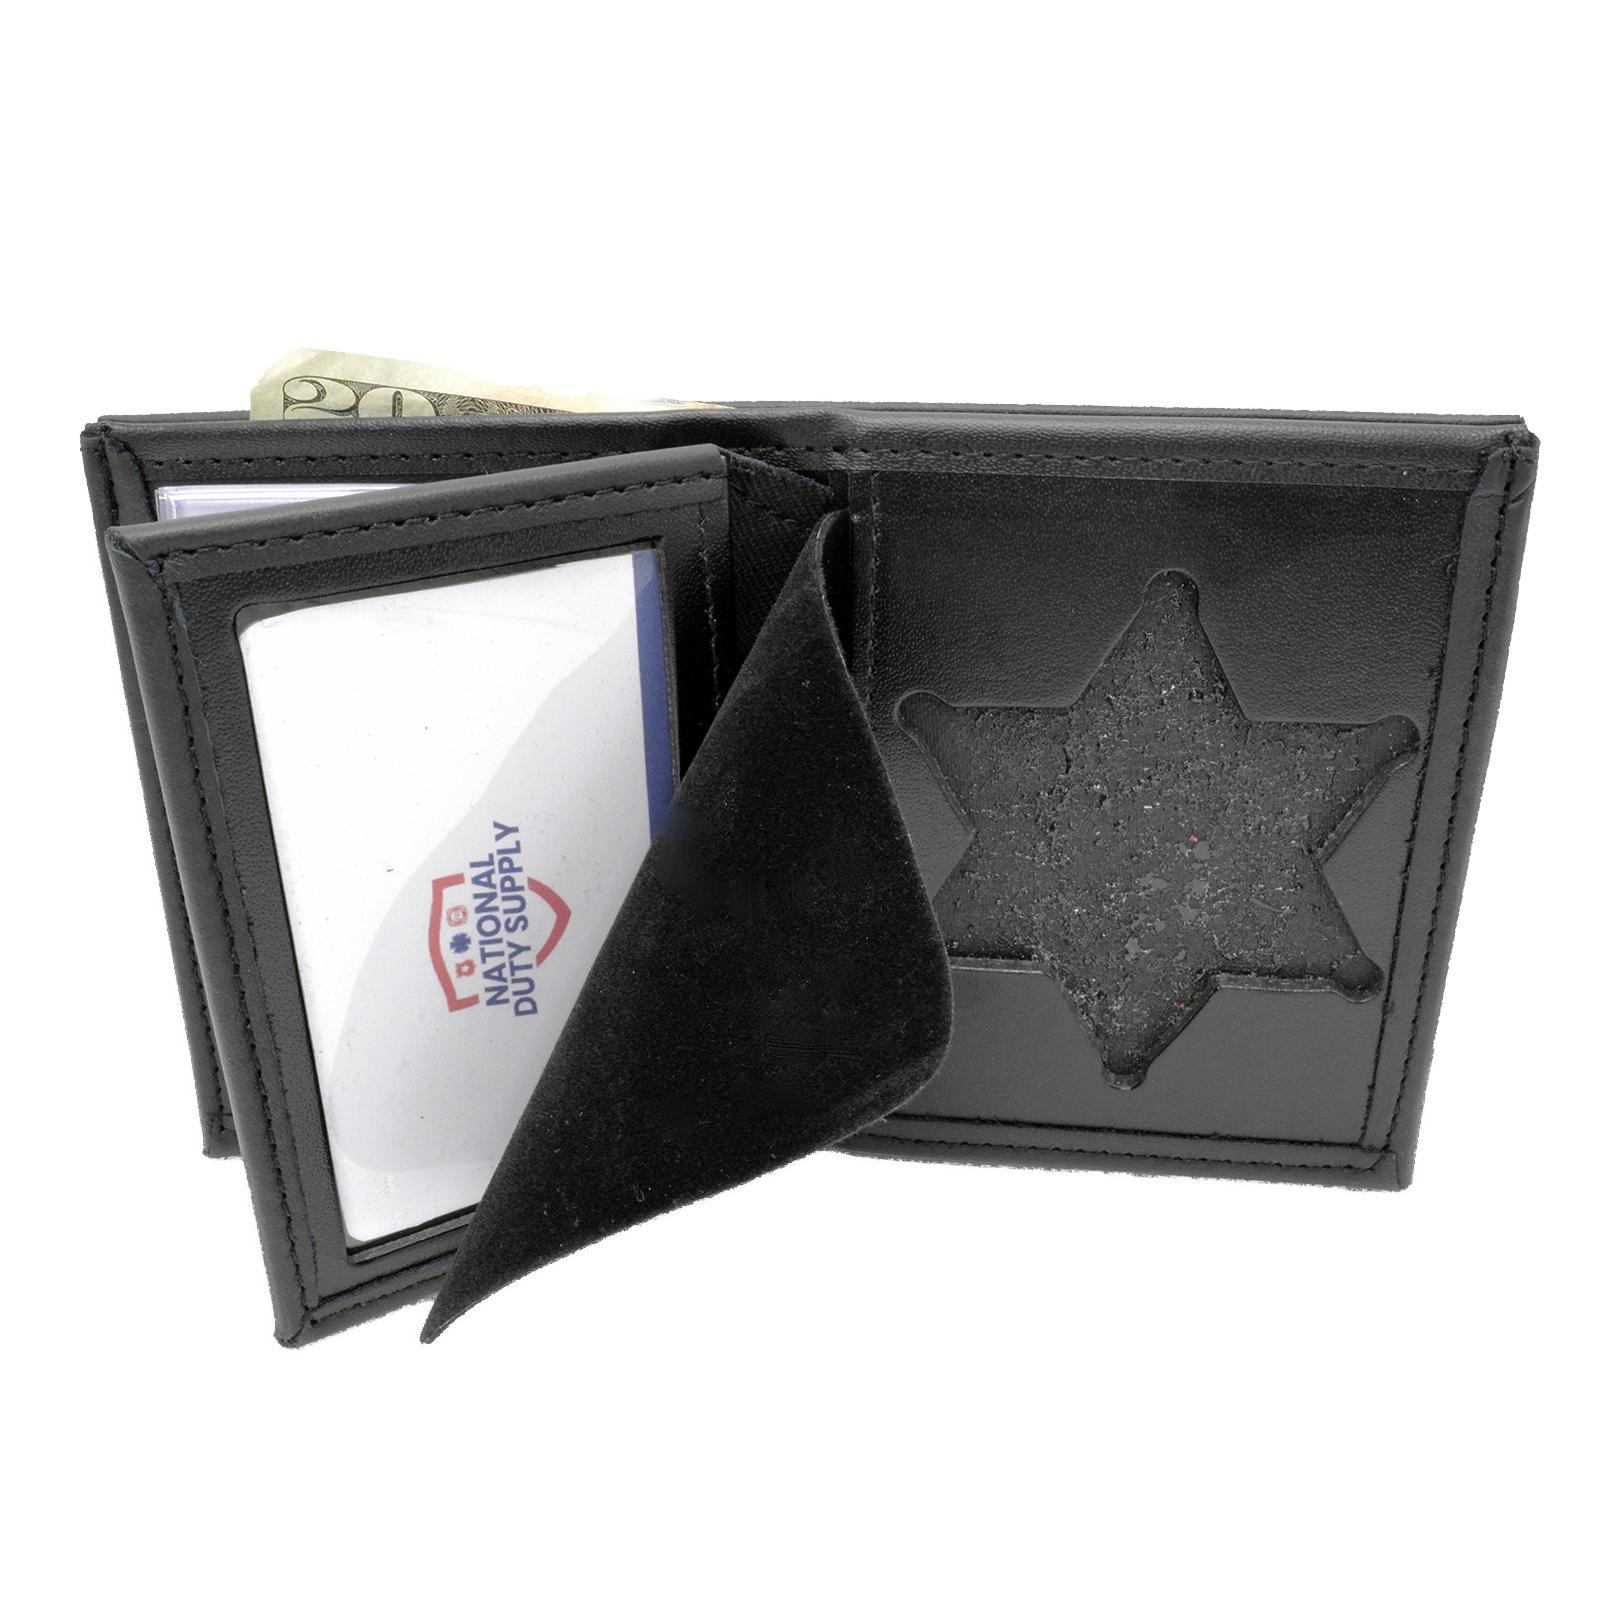 los-angeles-county-sheriff-flat-badge-wallet.jpg